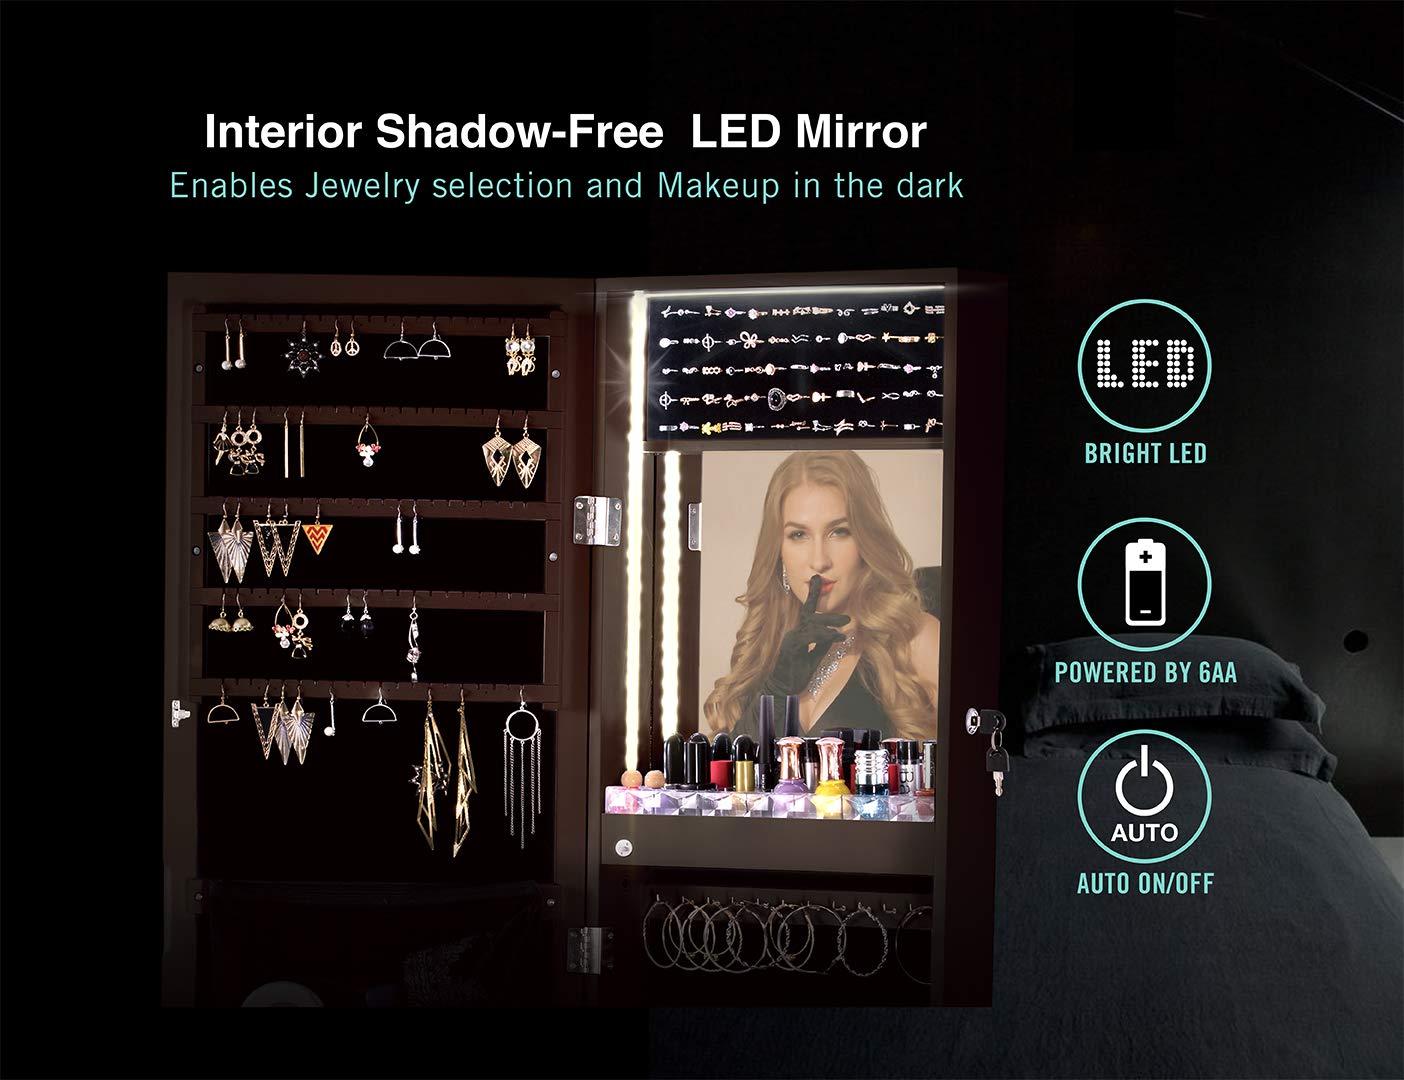 Large Storage Organizer w//Drawers LUXFURNI LED Light Jewelry Cabinet Standing Mirror Makeup Lockable Armoire espresso